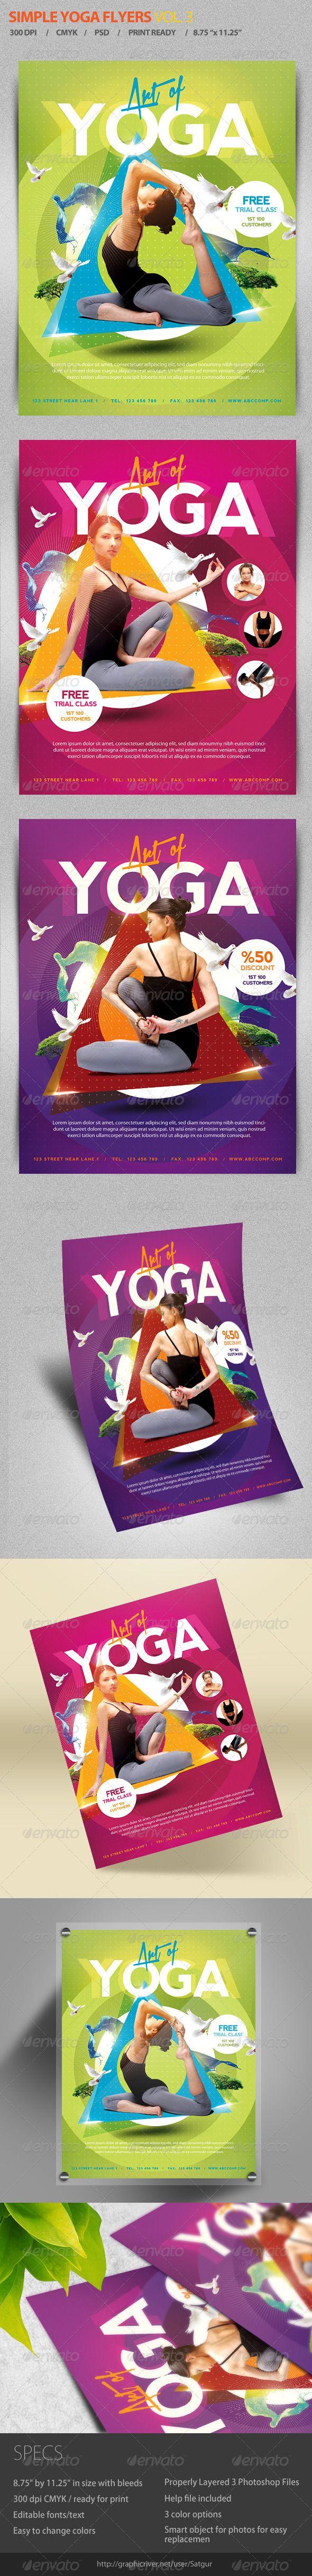 Zumba flyer design zumba flyers - Simple Yoga Flyer Template V3